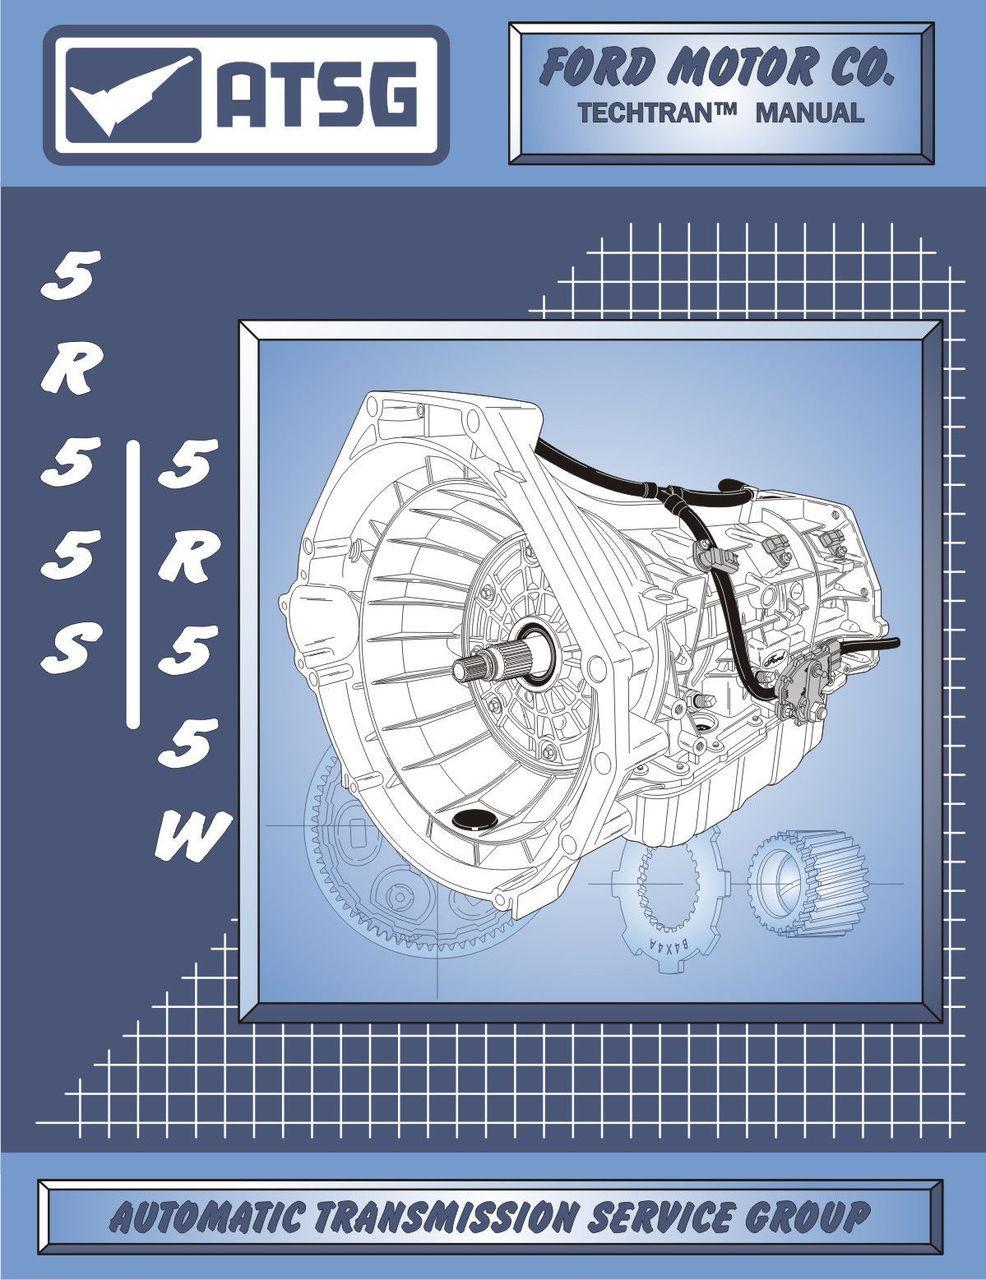 medium resolution of atsg tech manual 5r55w 5r55s ford mercury jaguar 2002 on rebuild guide book new ct powertrain products